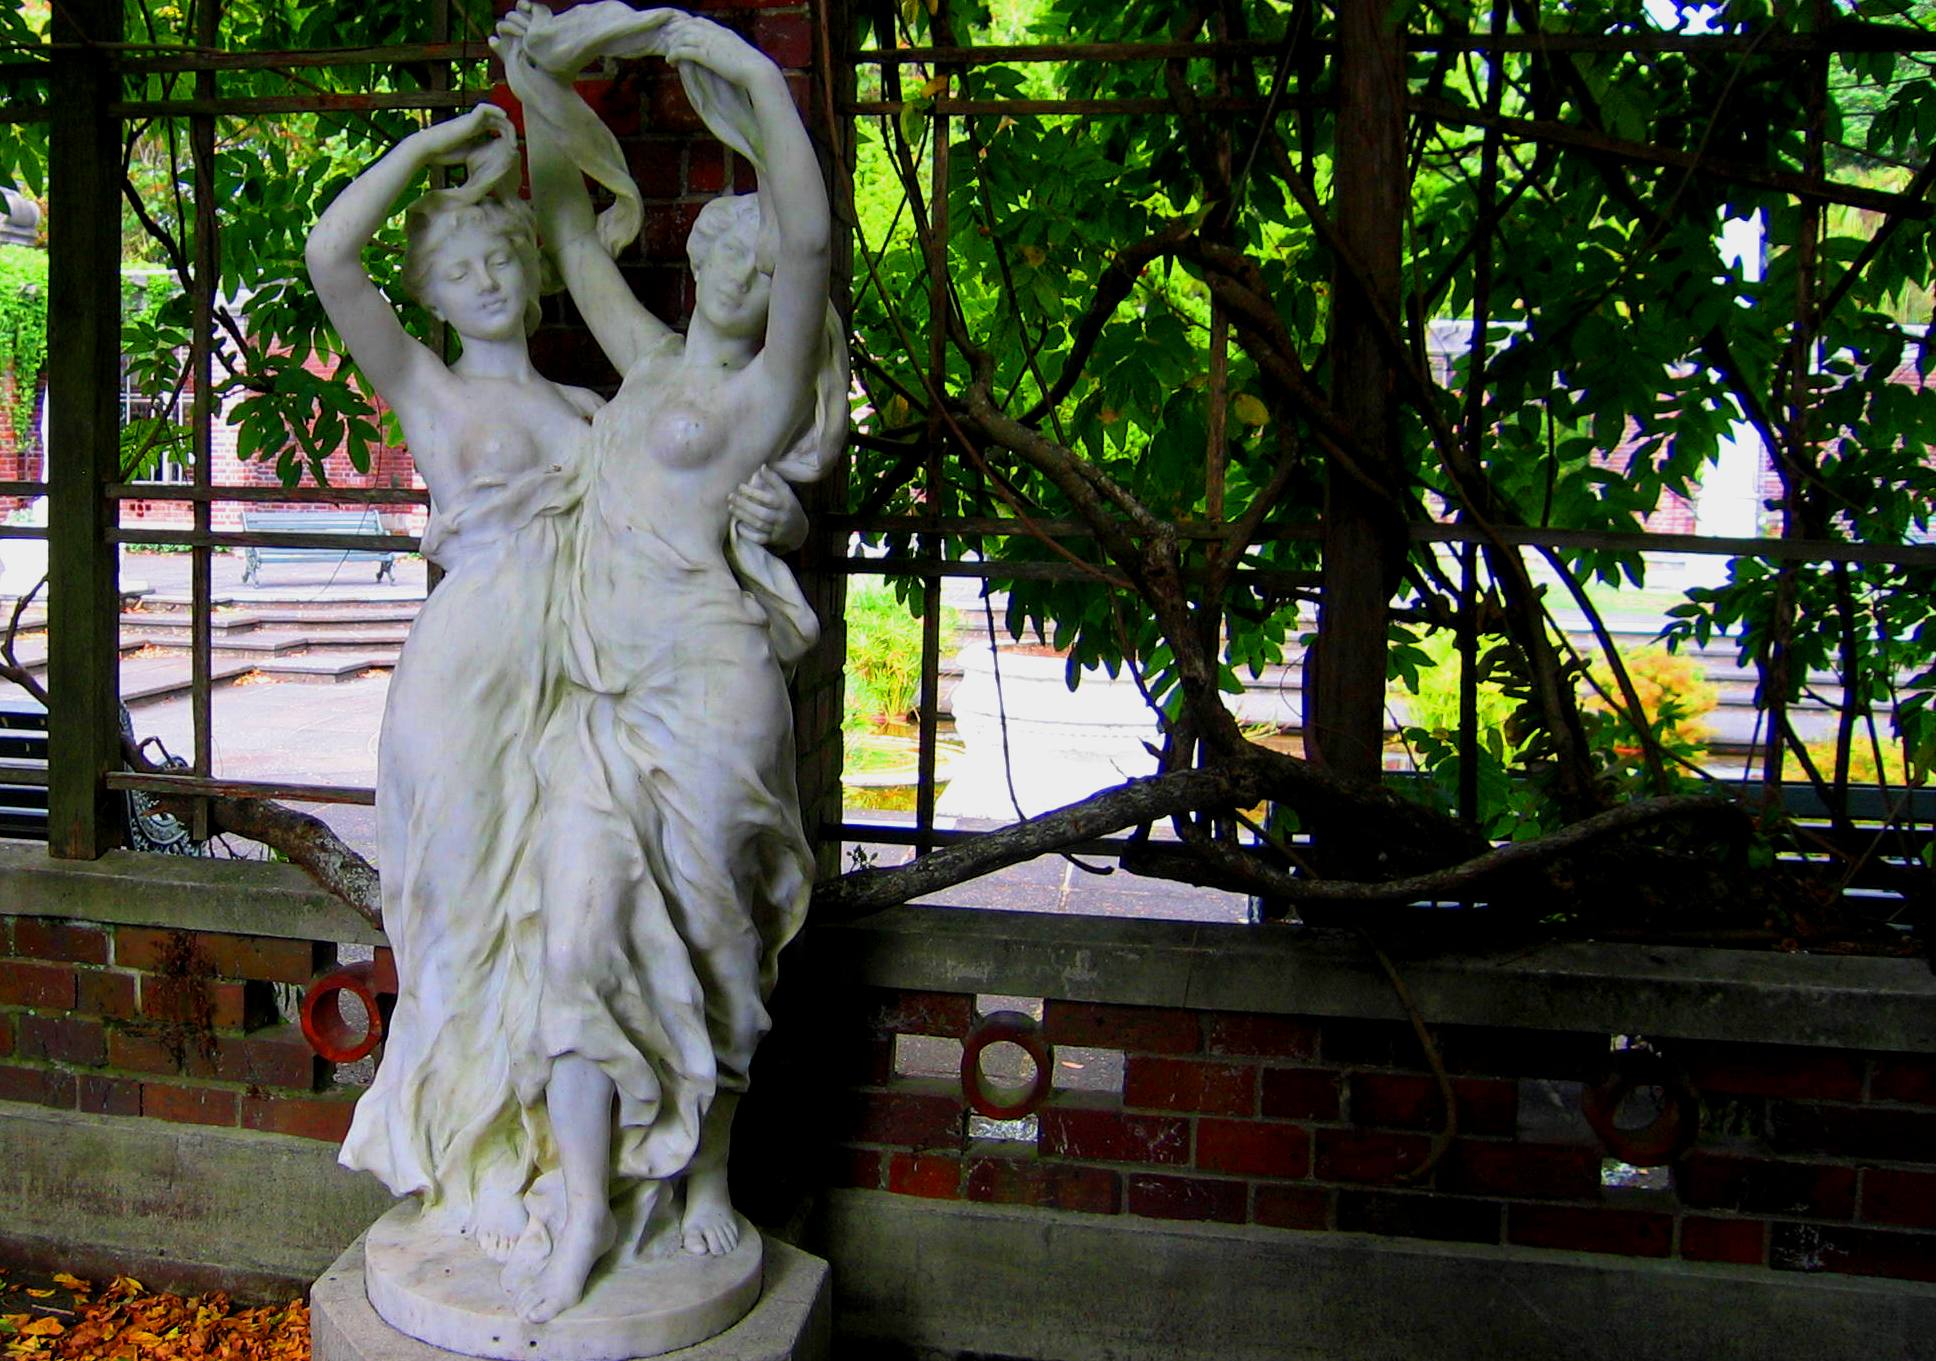 10 quite nice gardens to visit in new zealand nz top list